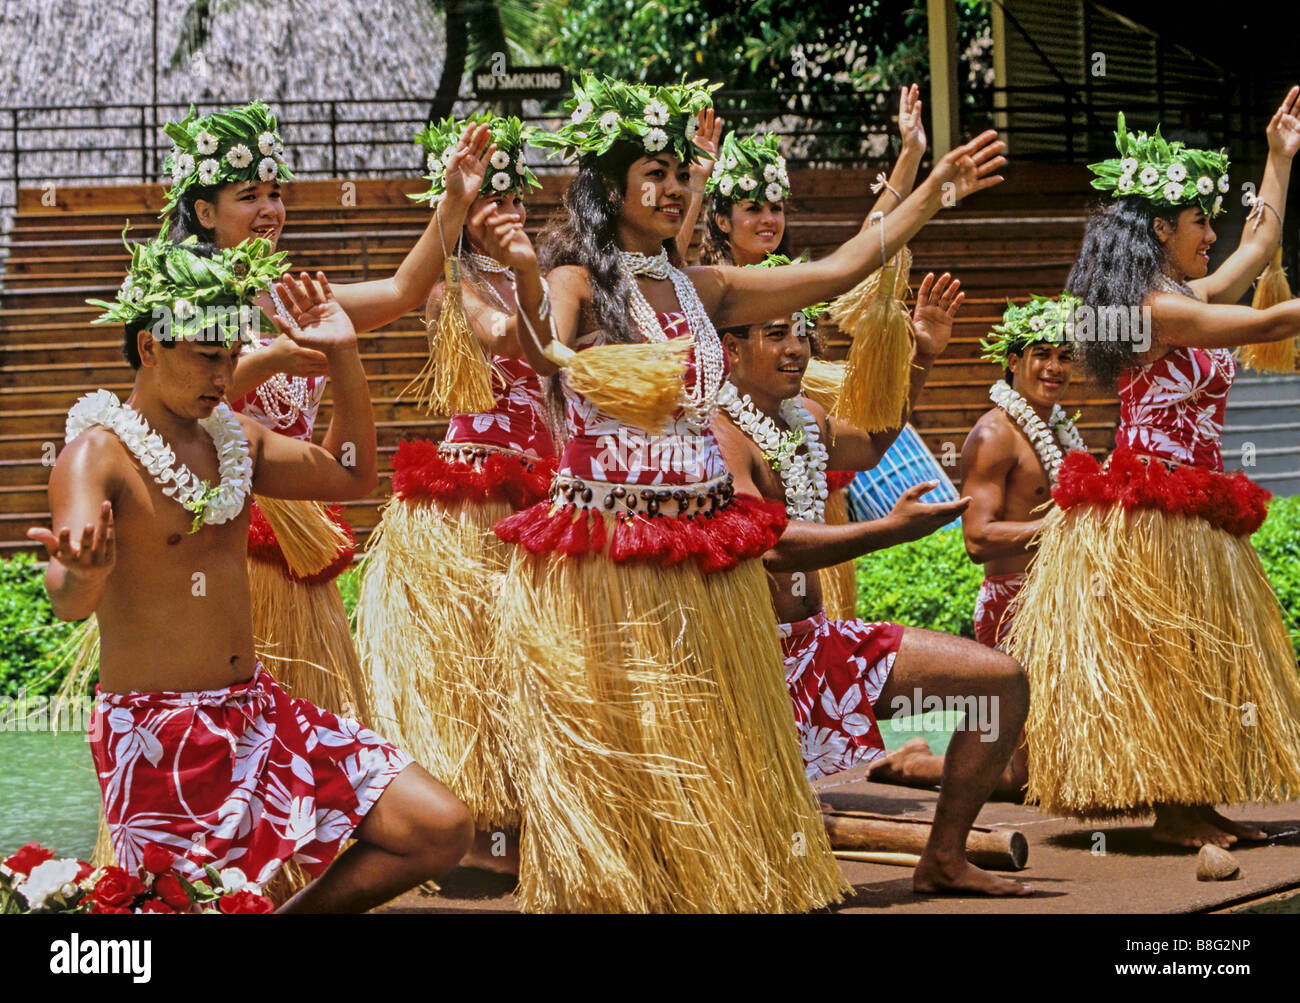 2183 Polynesian Cultural Centre Oahu Hawaii USA - Stock Image